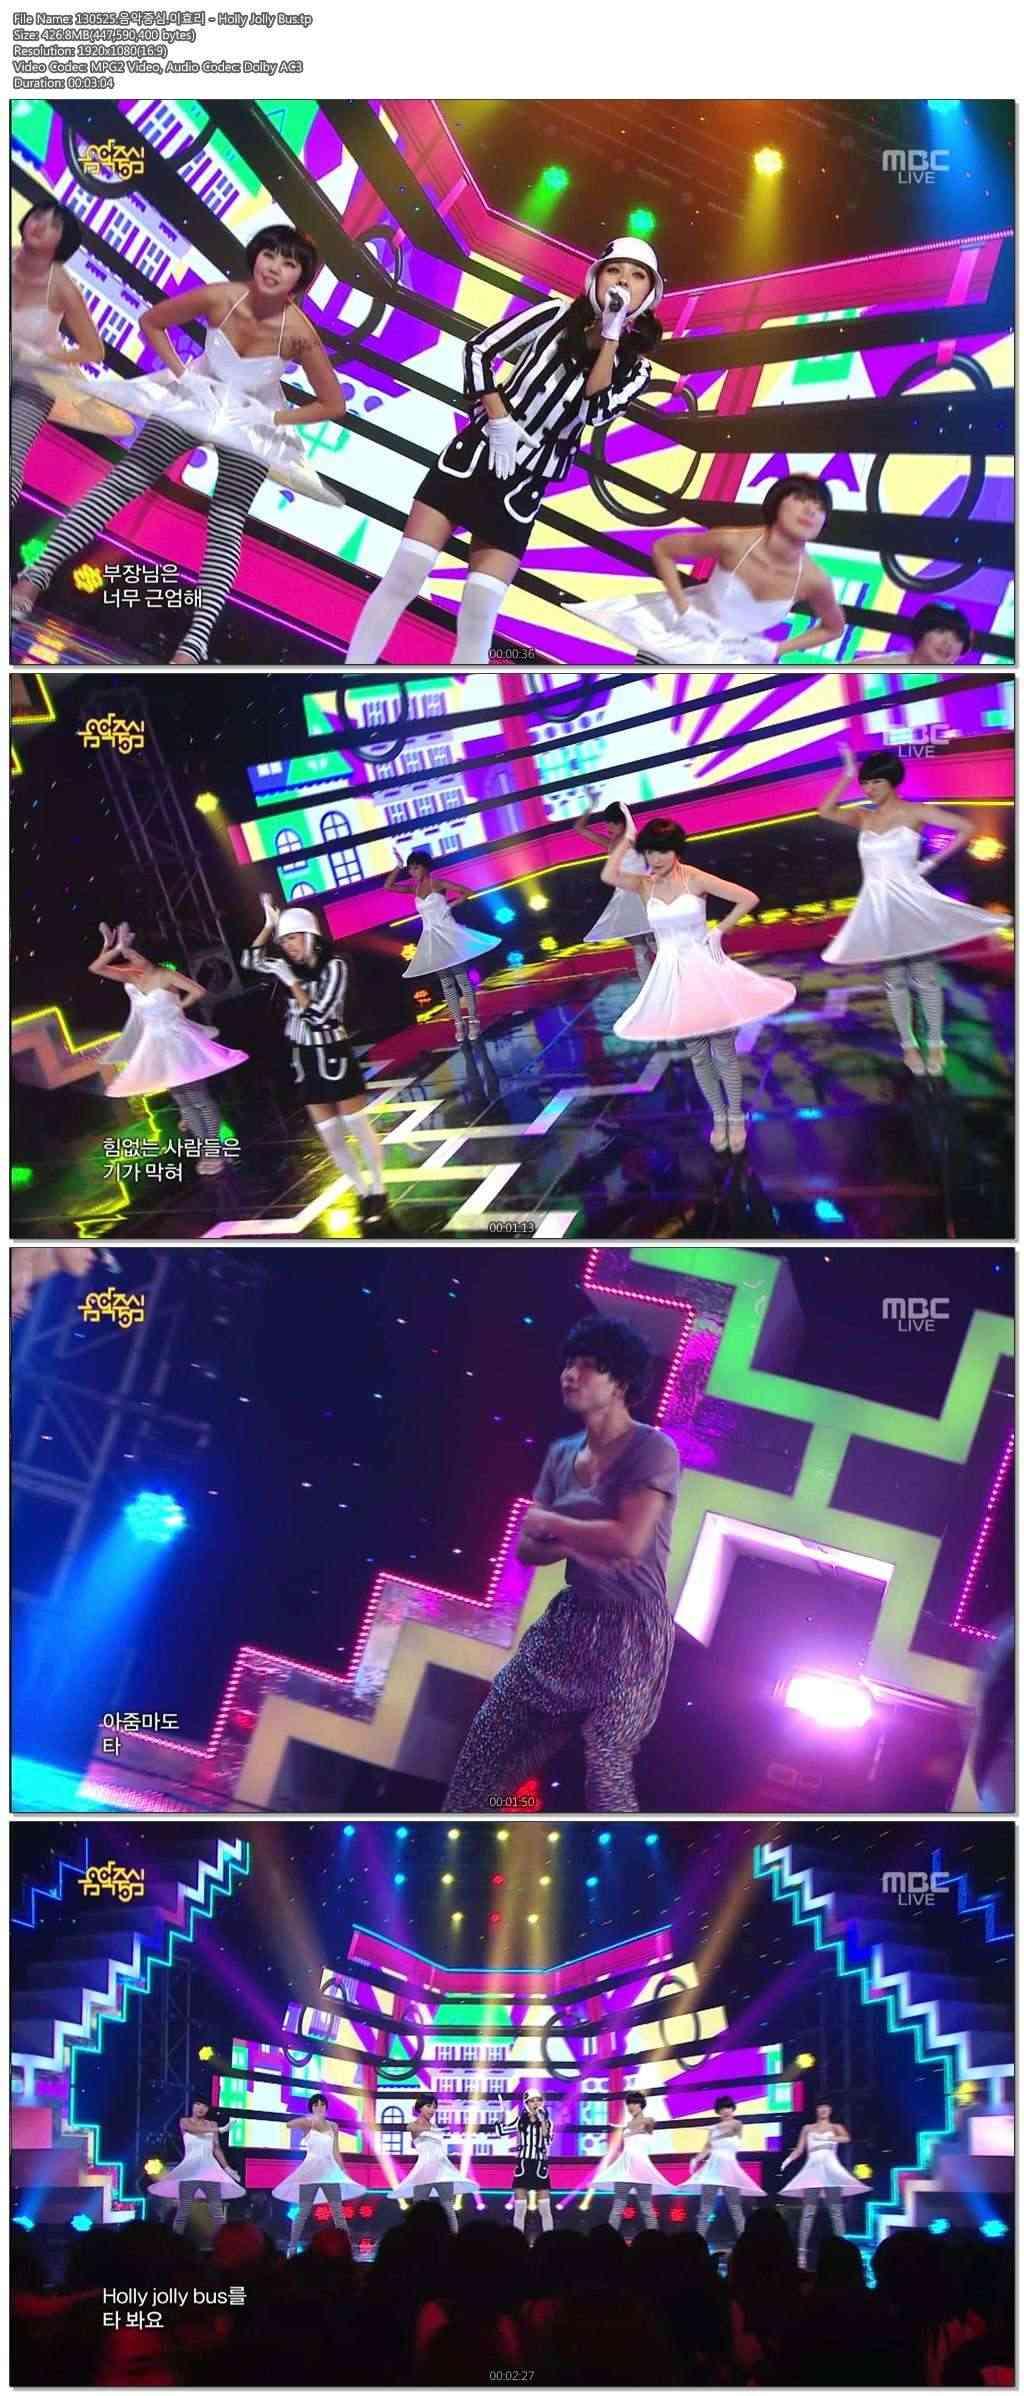 [130525] Hyori - Waiting Room, Holly Jolly Bus & Bad Girls @ MBC Music Core 7ria4g10